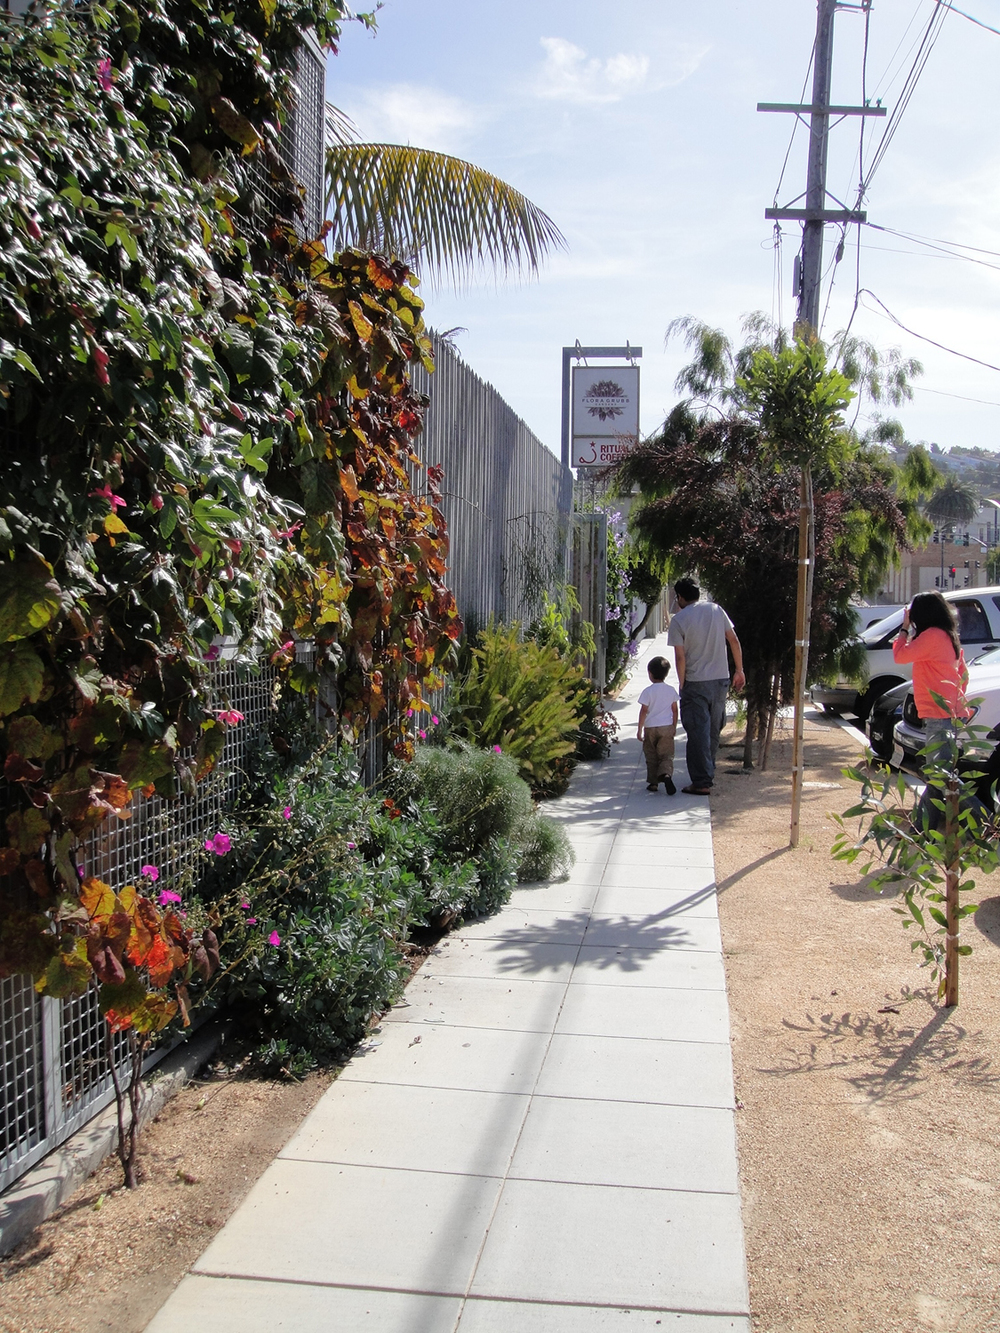 Commercial Nursery Sidewalk Garden